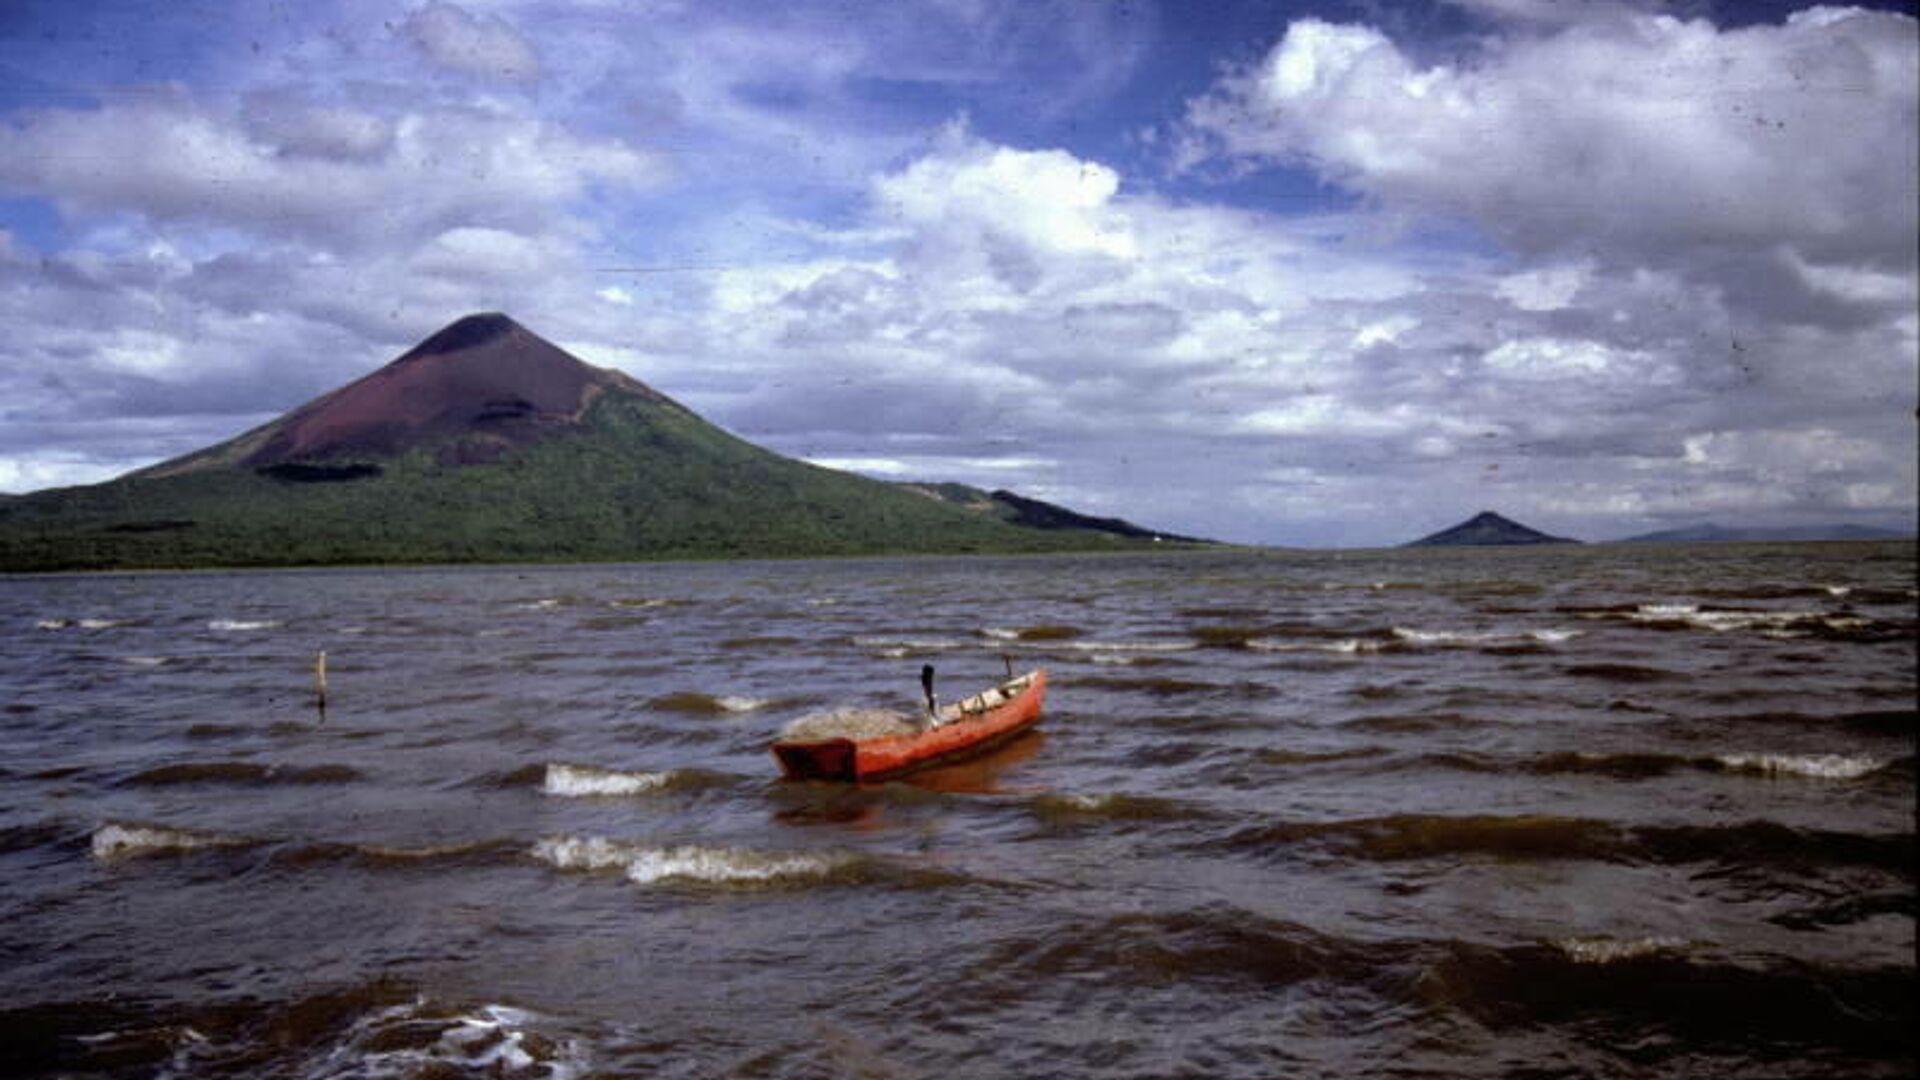 El Lago Managua - Sputnik Mundo, 1920, 25.08.2021